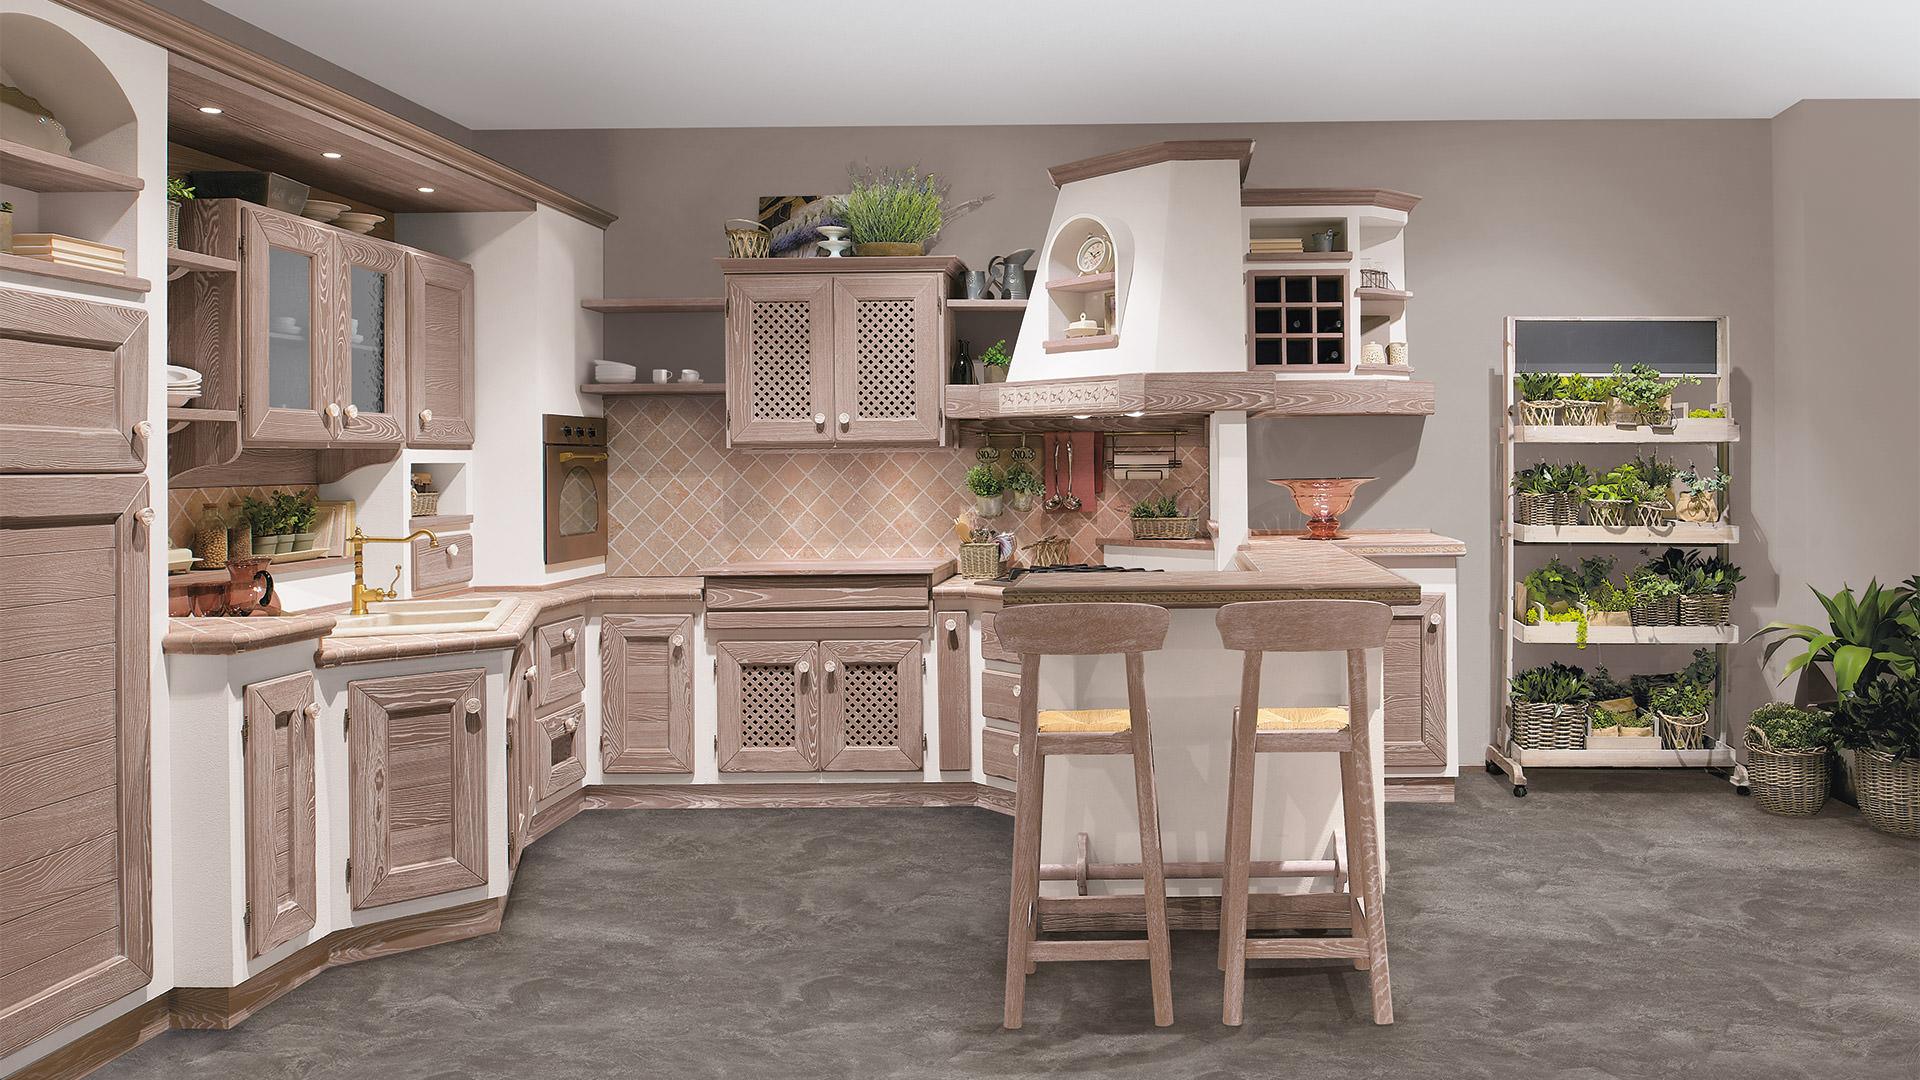 Stunning cucina lube classica ideas - Cucina classica contemporanea ...